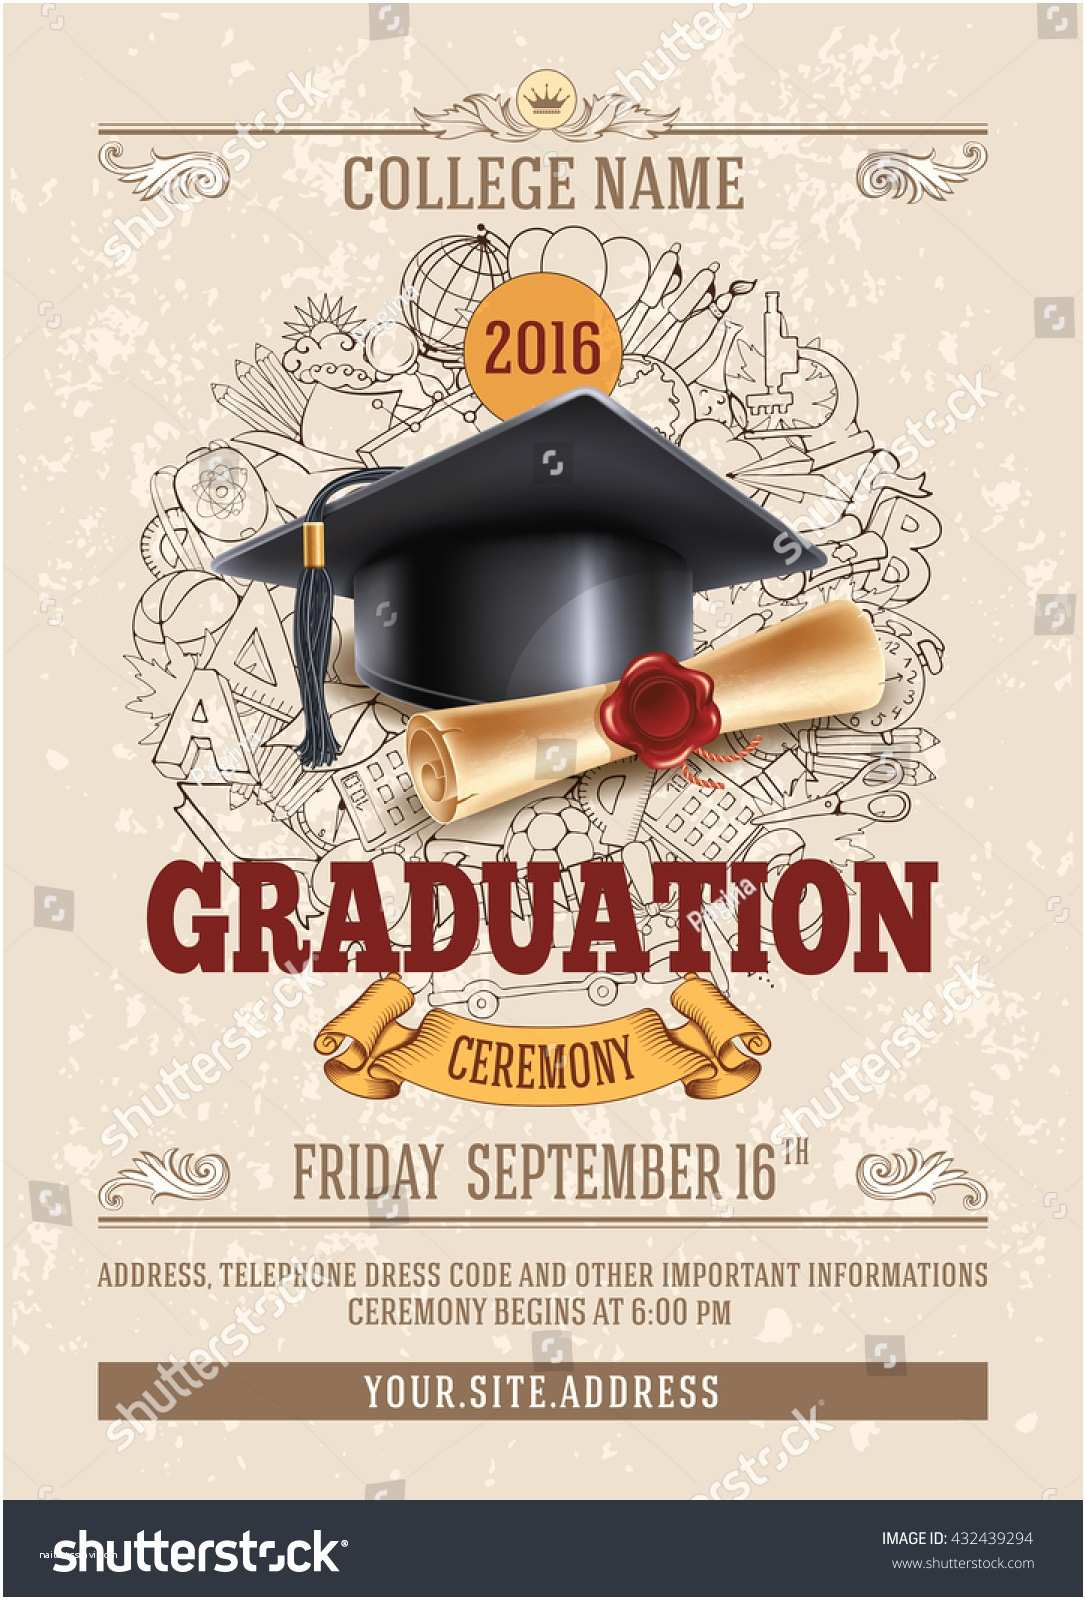 Graduation Ceremony Invitation Invitation Card Graduation Ceremony Choice Image